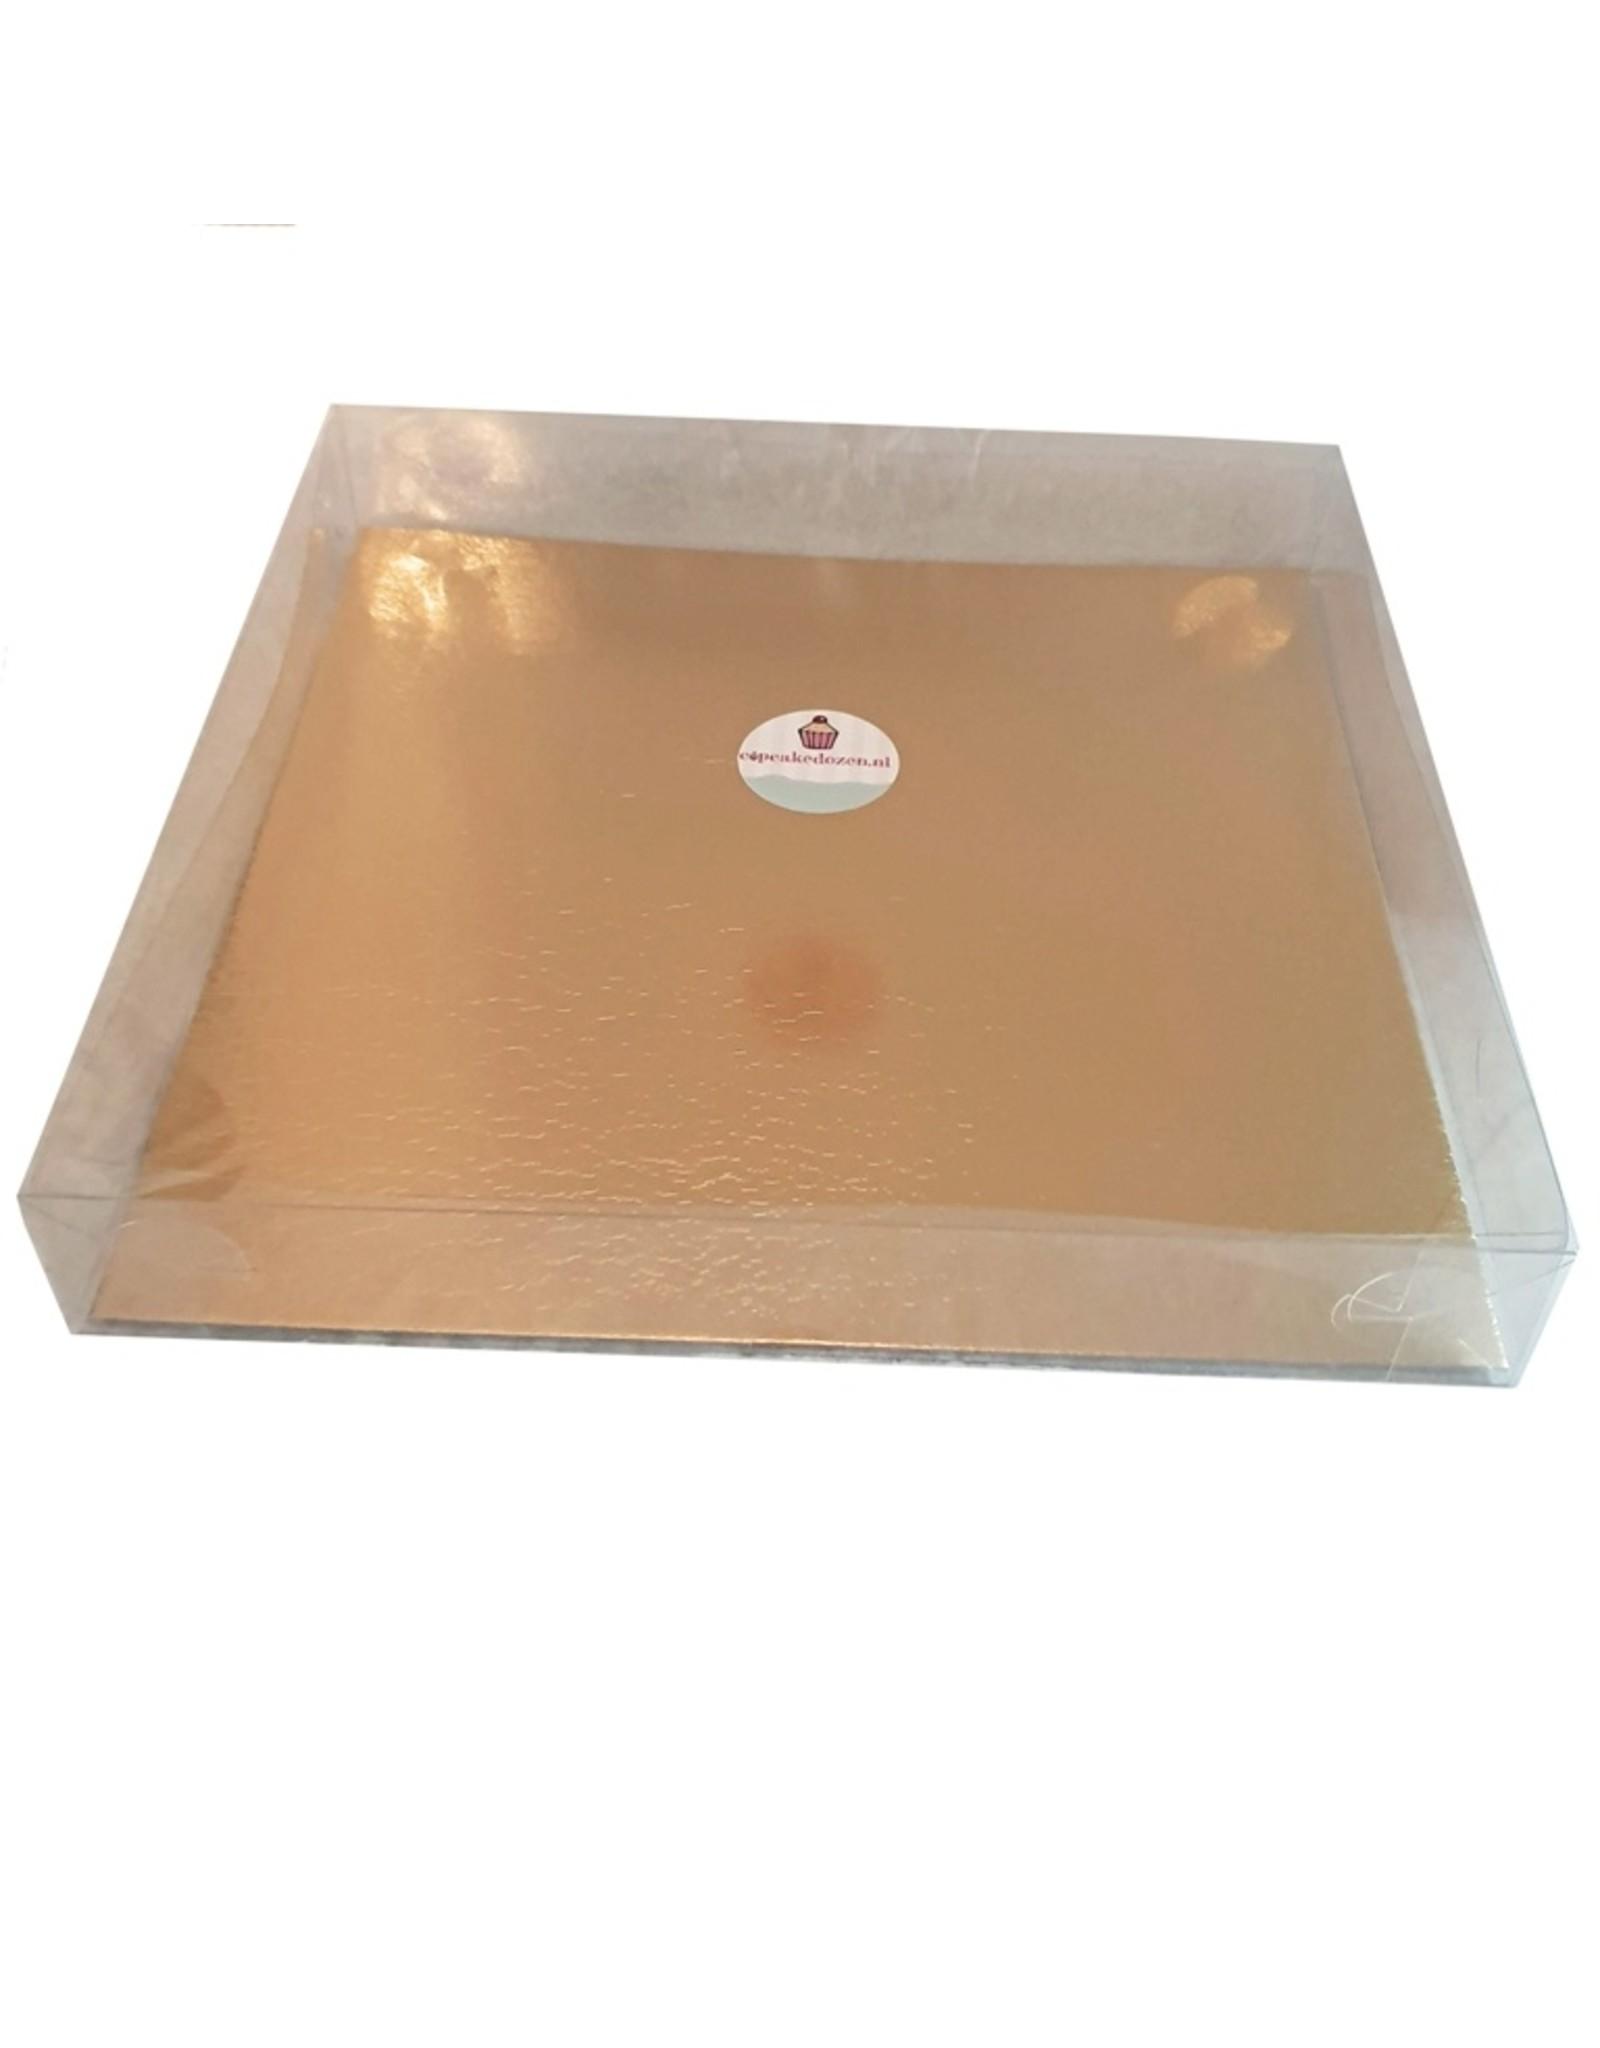 Clear box - 29,5x29,5x4,5 (per 100 pieces)